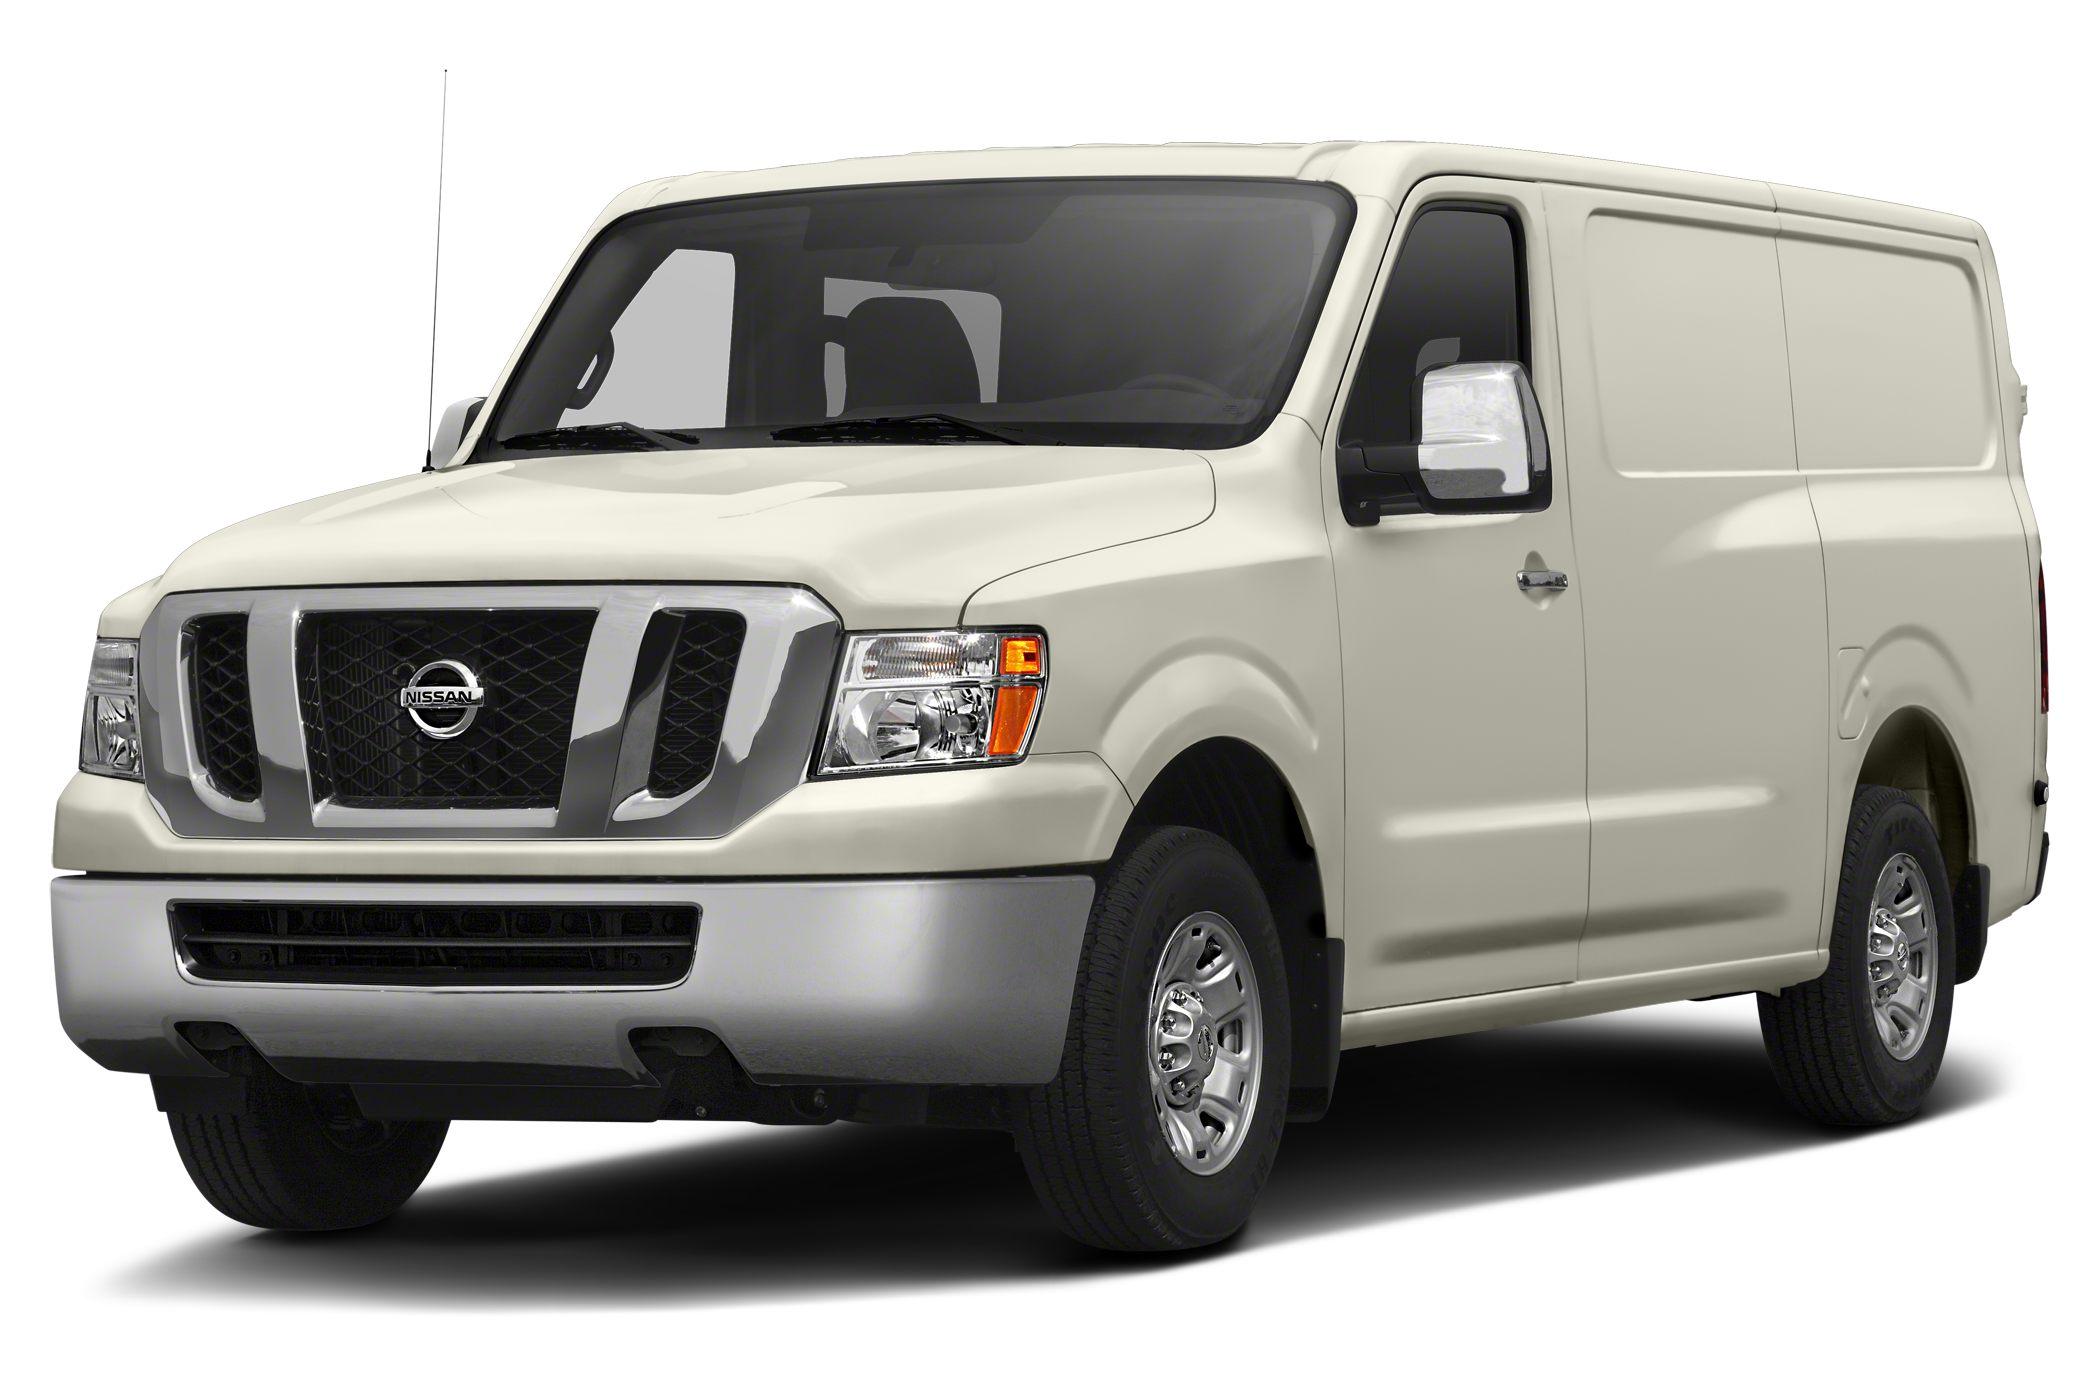 2018 Nissan Nv Cargo Nv2500 Hd Specs Safety Rating Amp Mpg